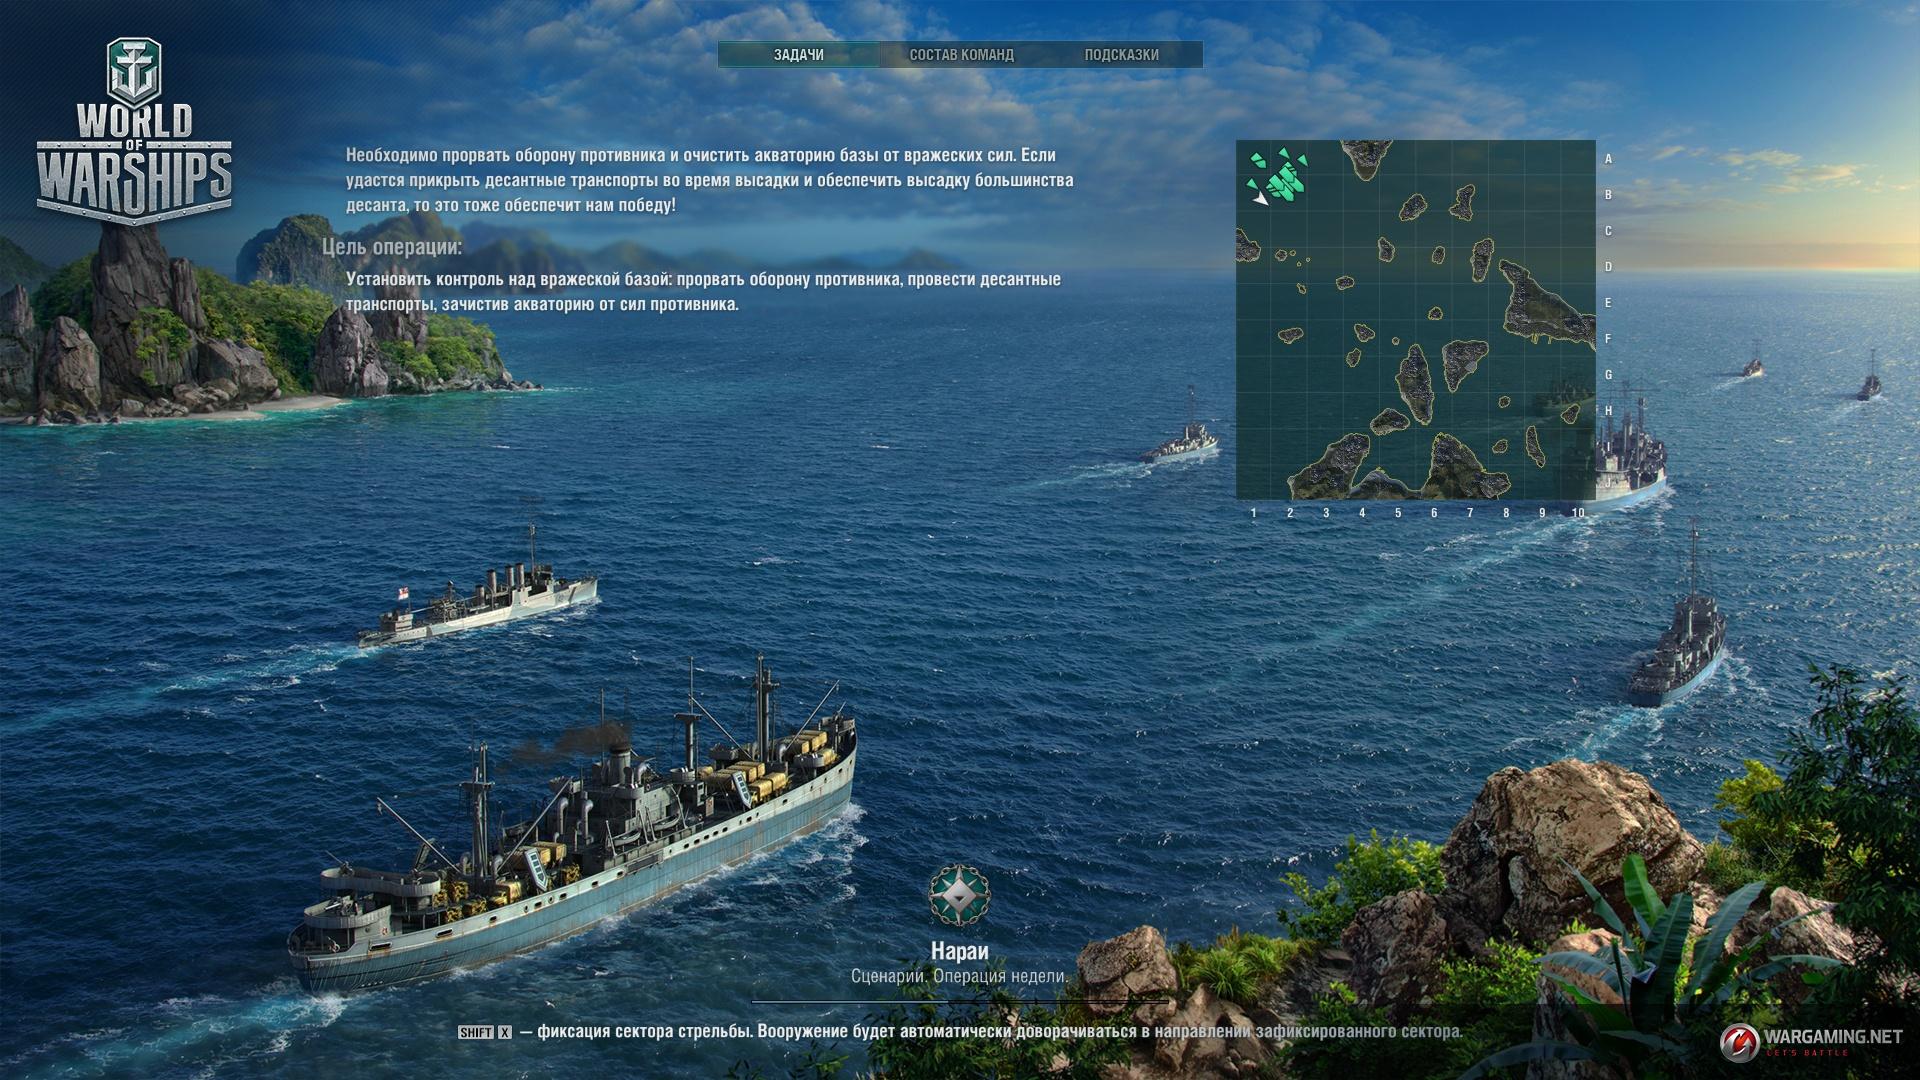 Обои wg, wargaming net, wows, мир кораблей, шторм. Игры foto 8